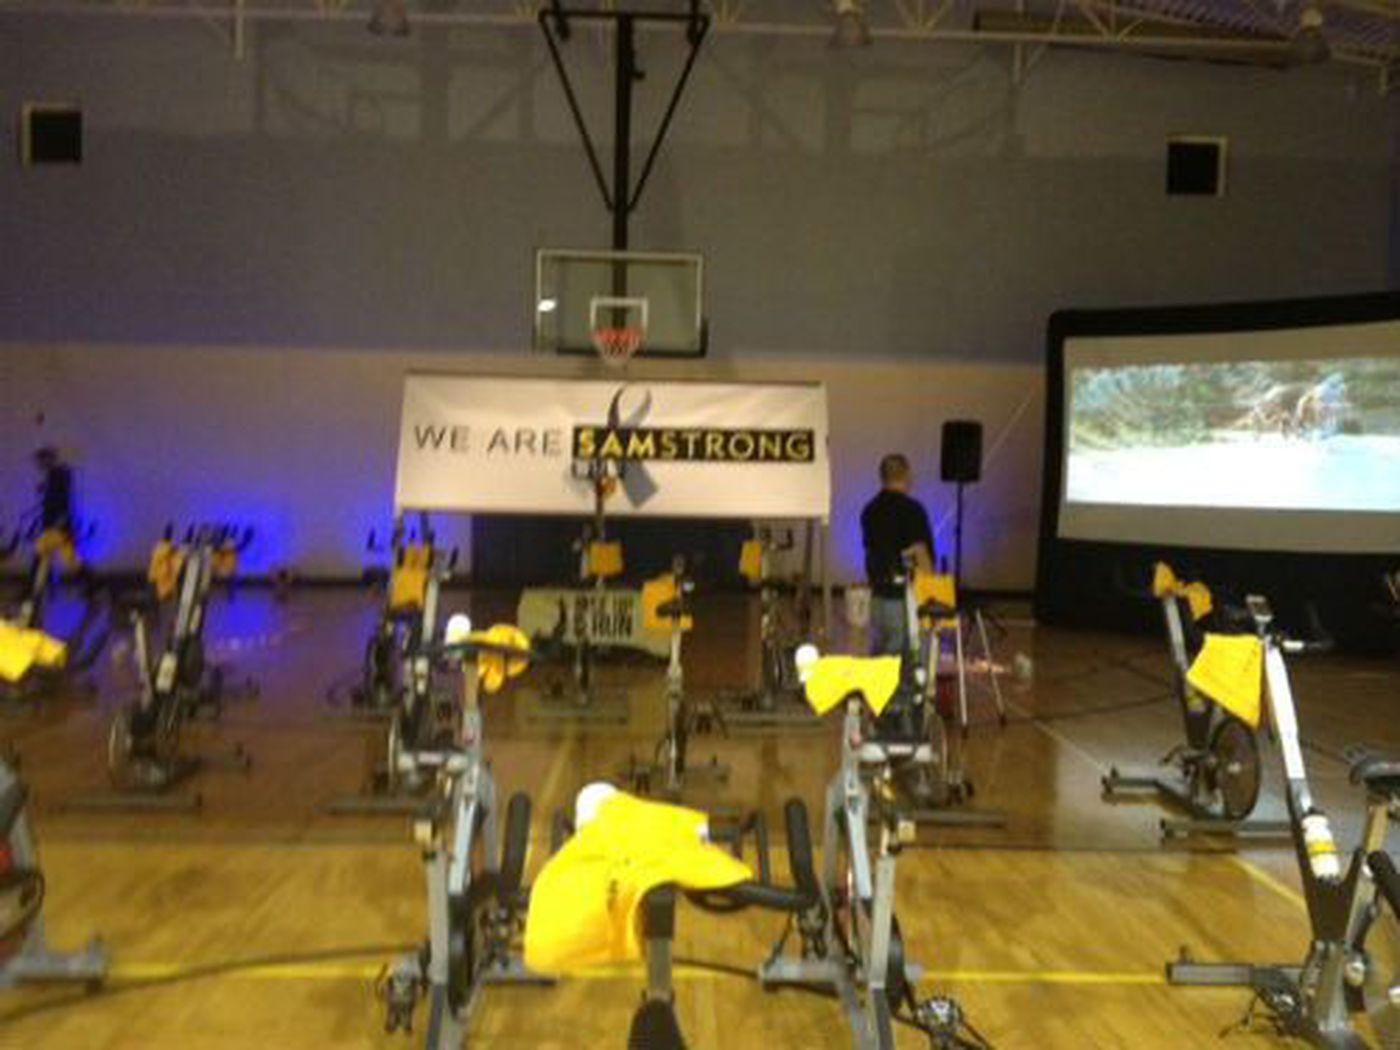 Ridestrong' for Samstrong at Bob's Gym